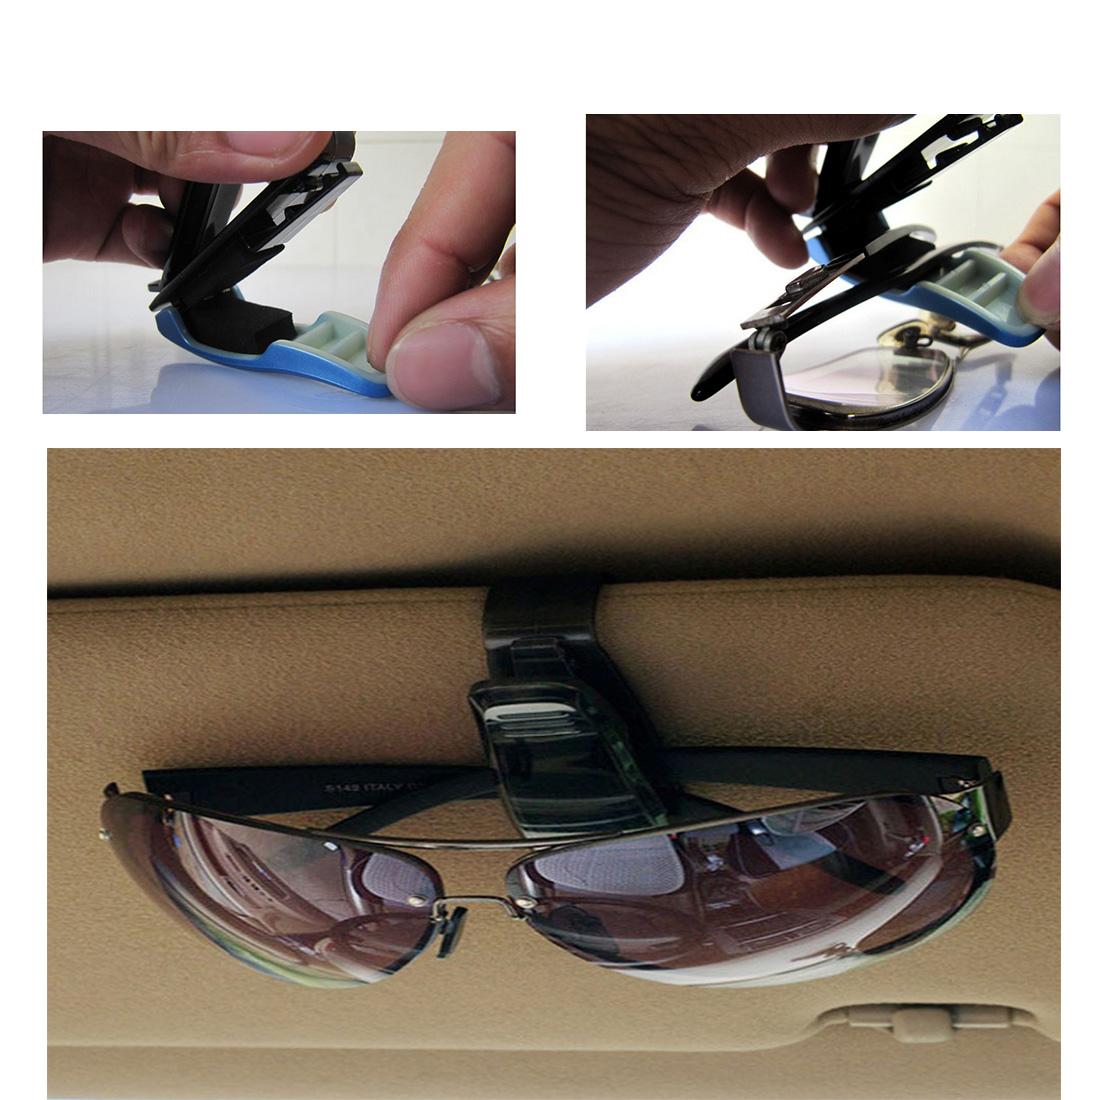 a7b54fdc665 Details about 1X New Car Auto Sun Visor Sunglasses Eye Glasses Clip Case  Phone CD Holder Clip